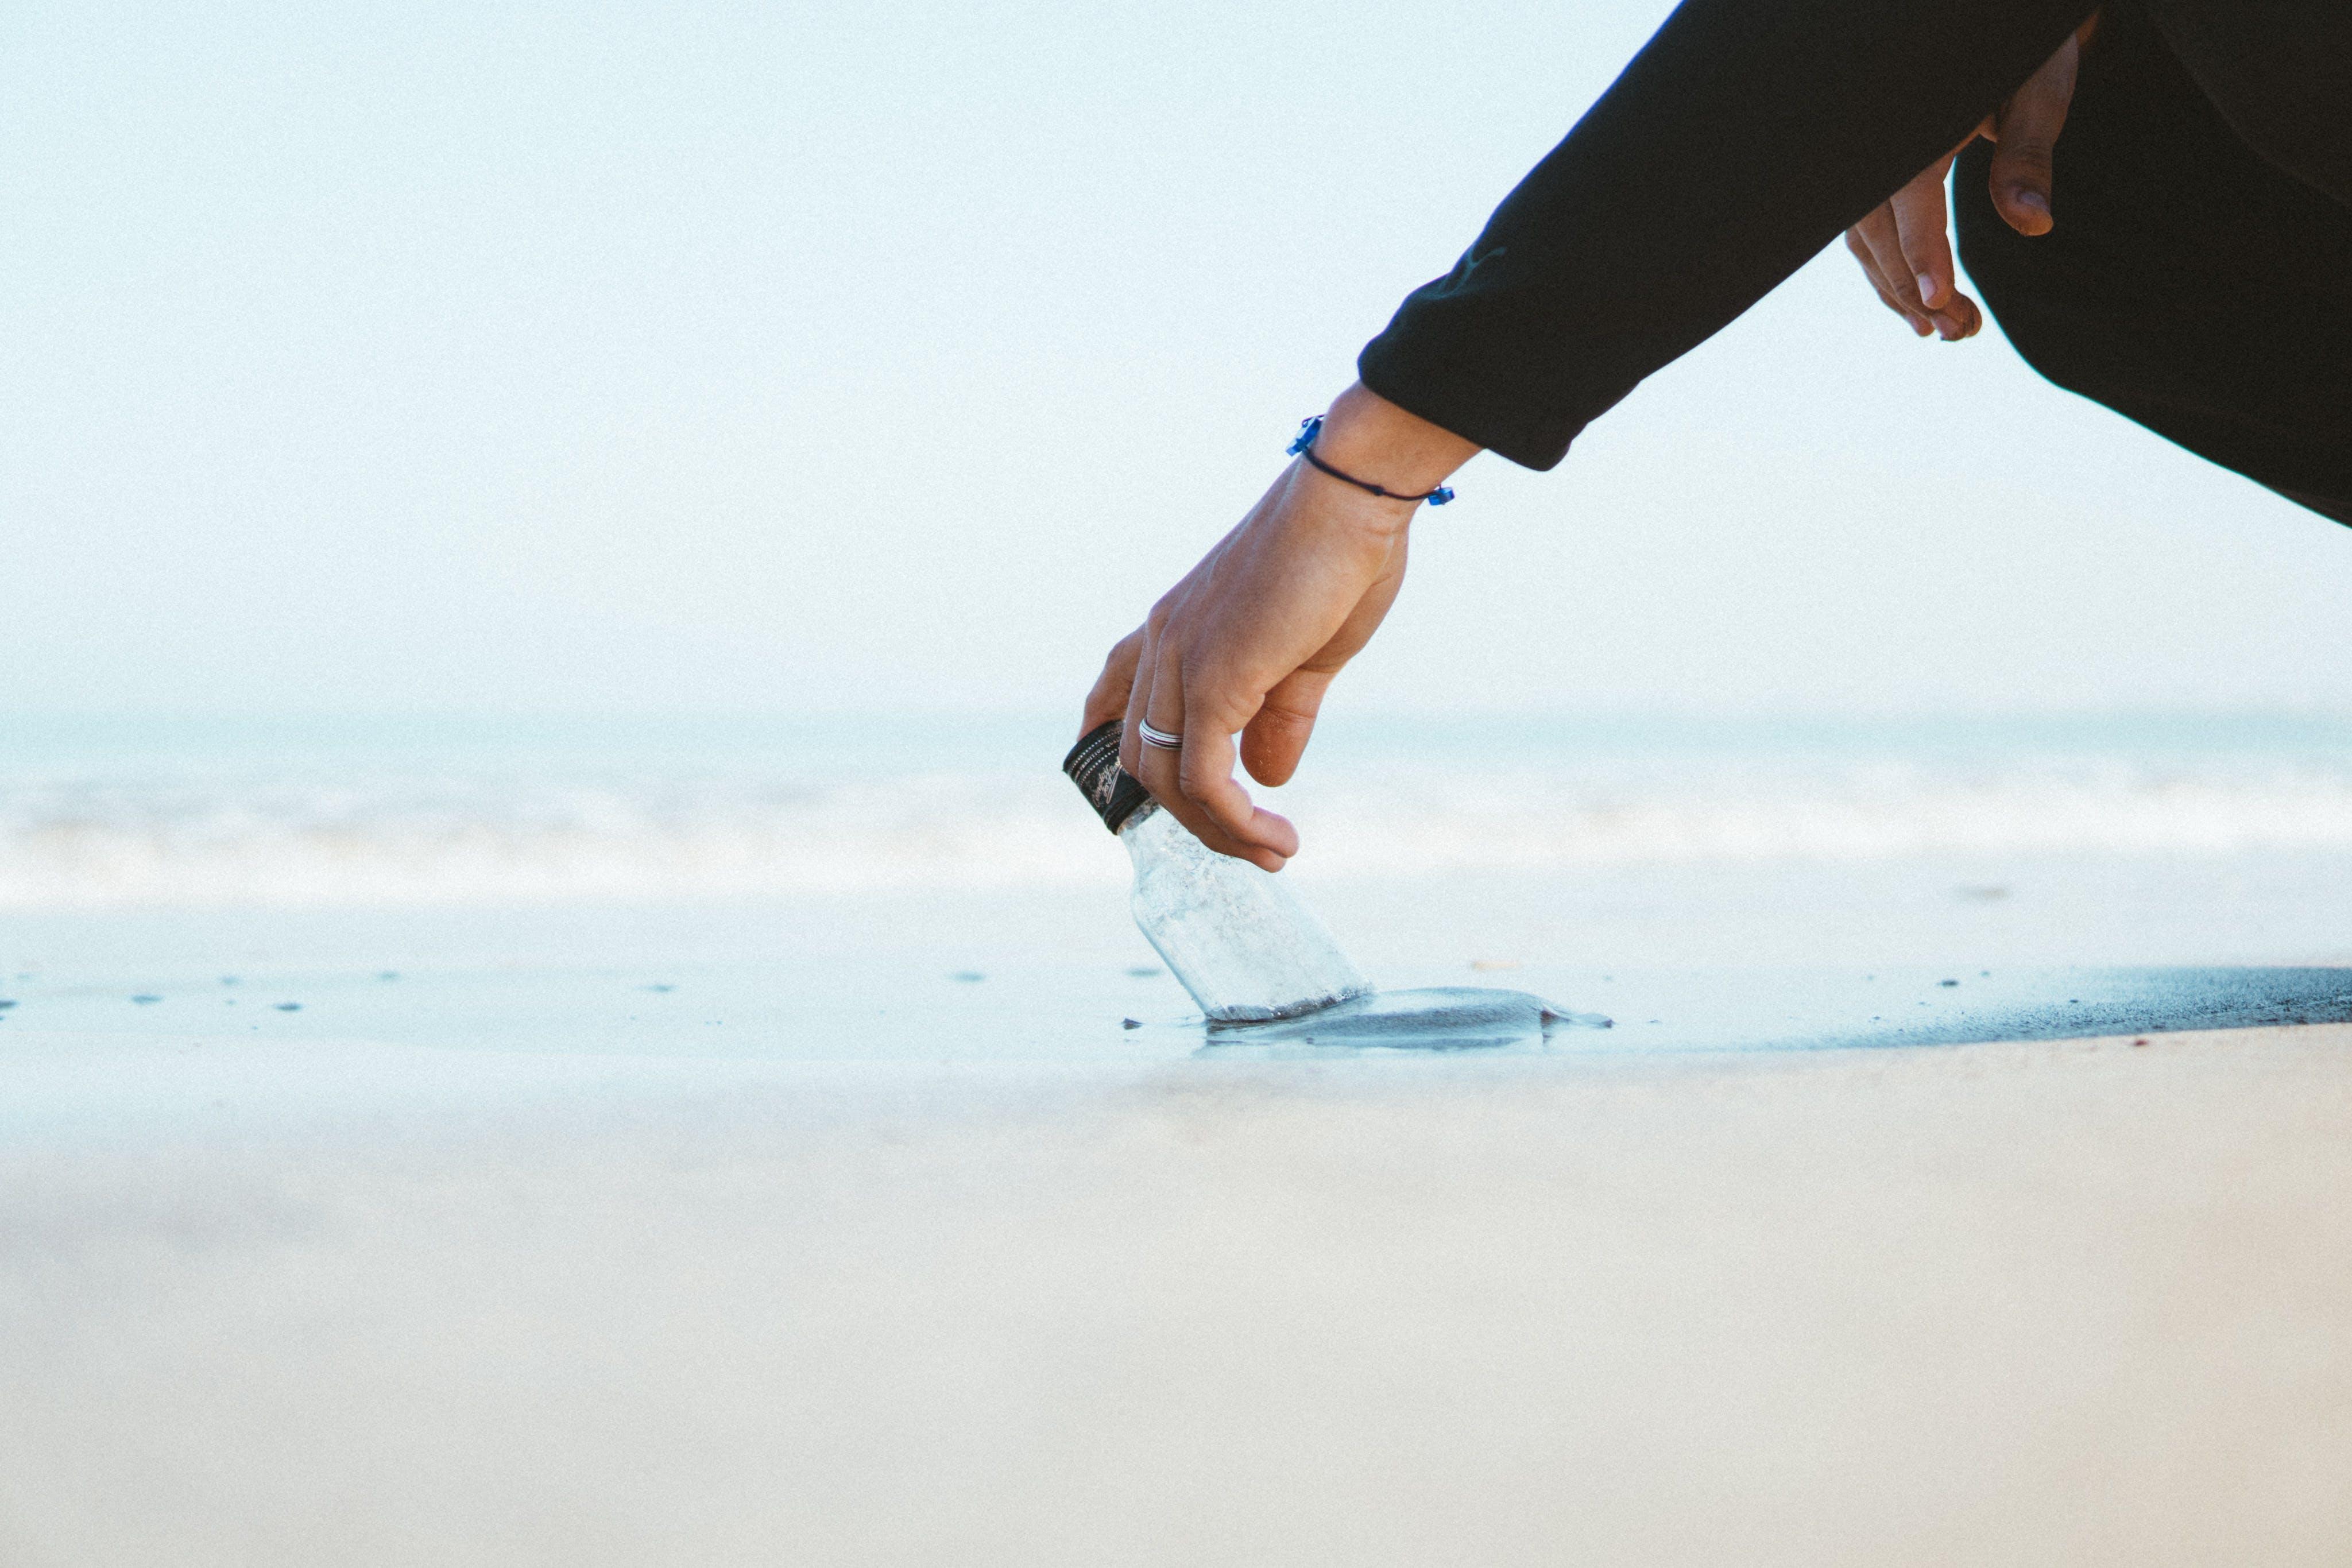 Person Wearing Black Long-sleeved Top Holding Bottle in Ocean